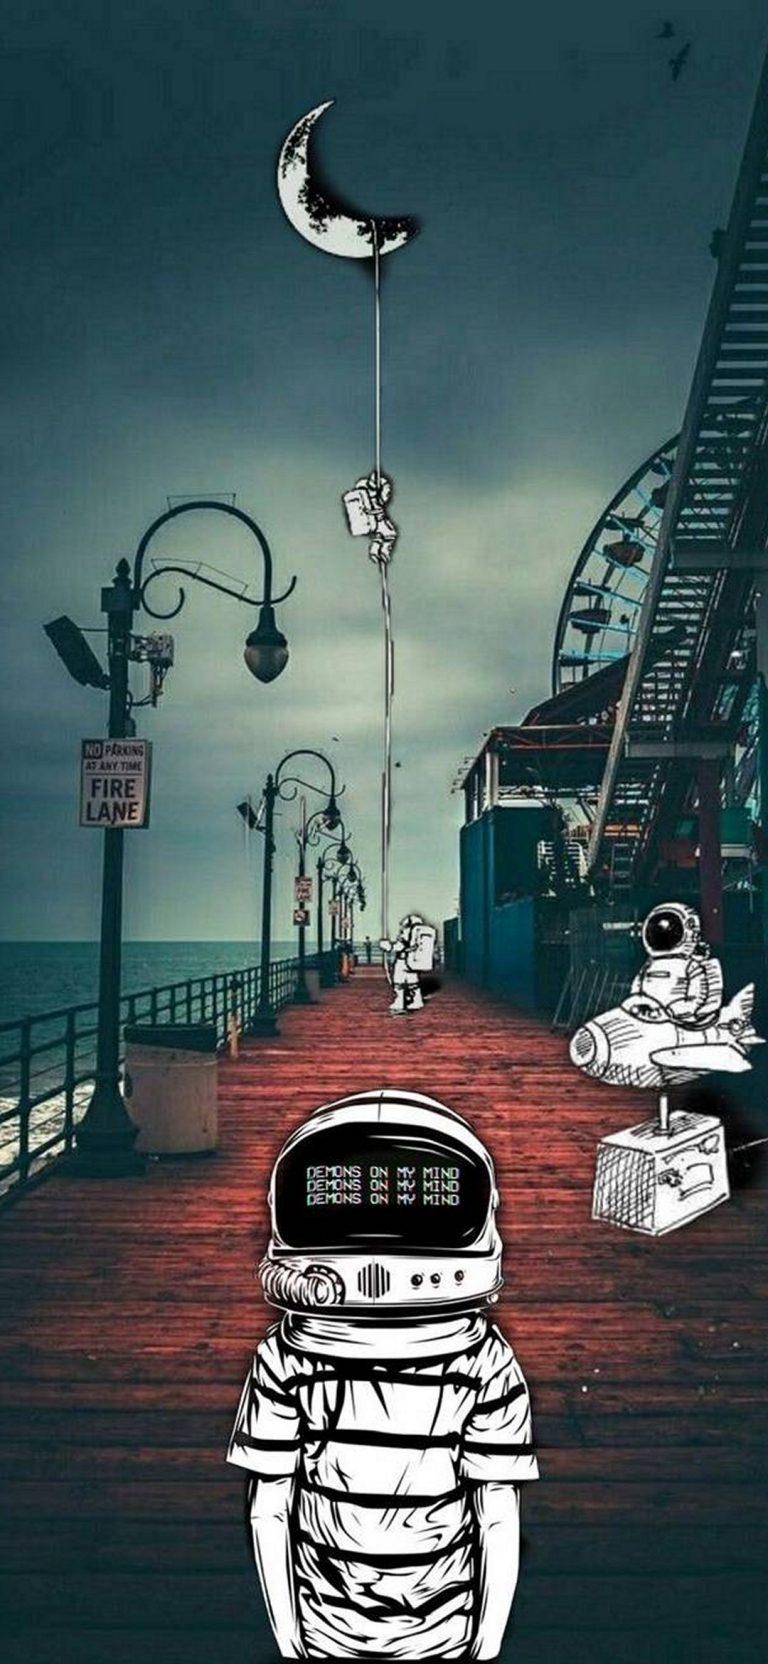 Space Phone Wallpaper 127 1080x2340 768x1664